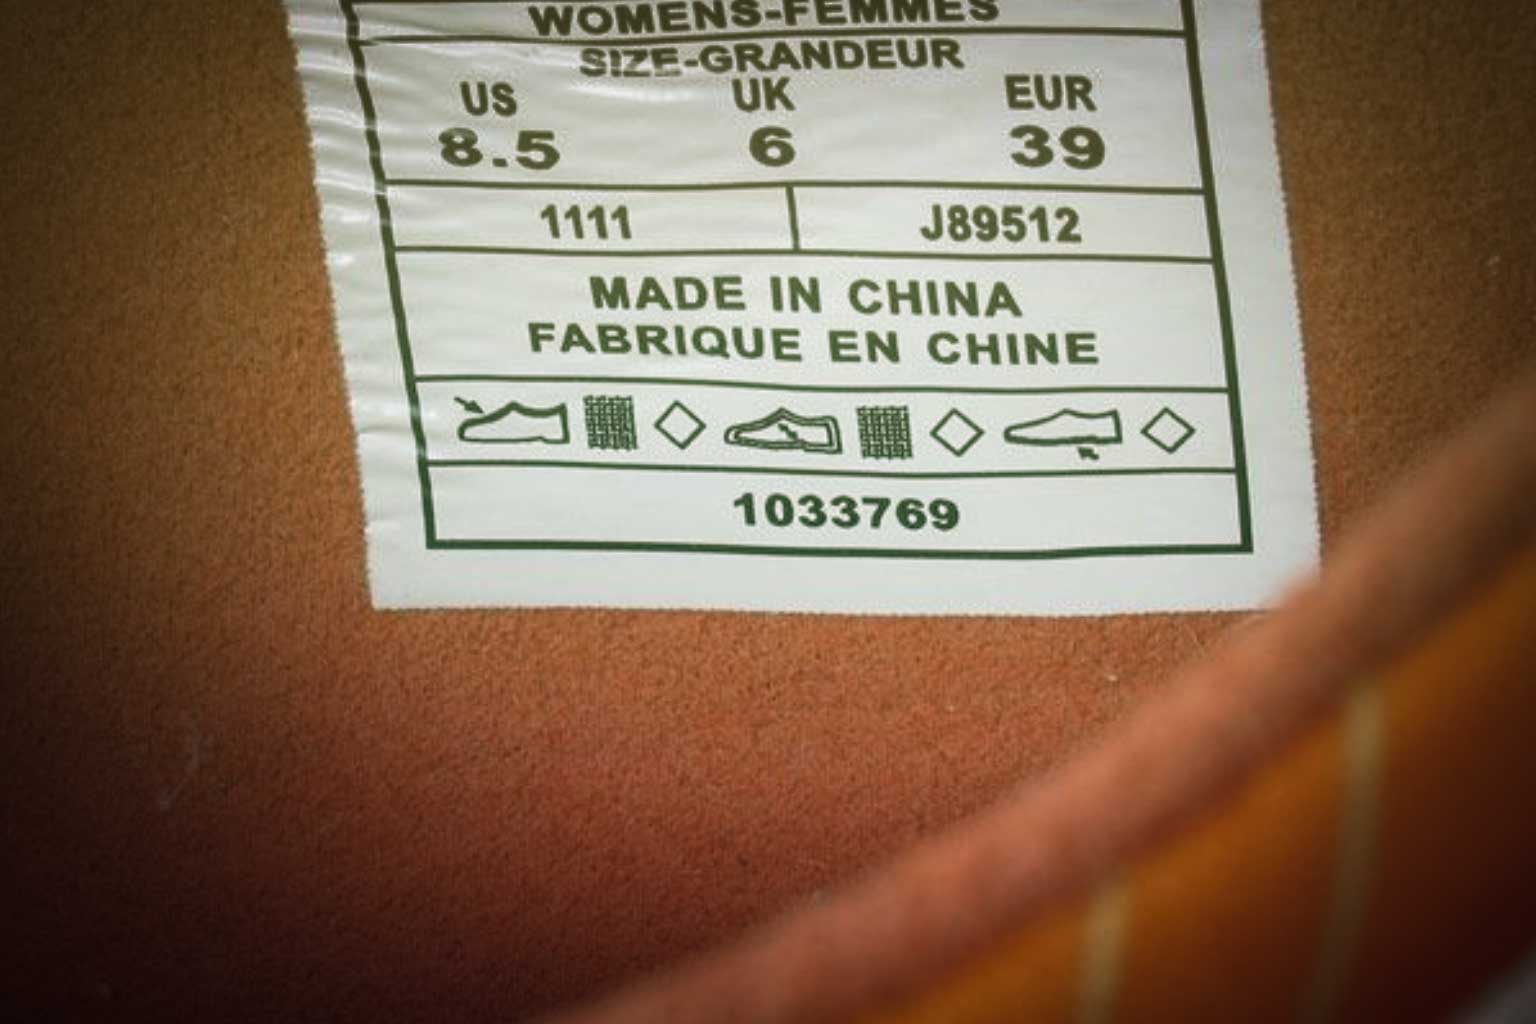 foto di un'etichetta di una scarpa